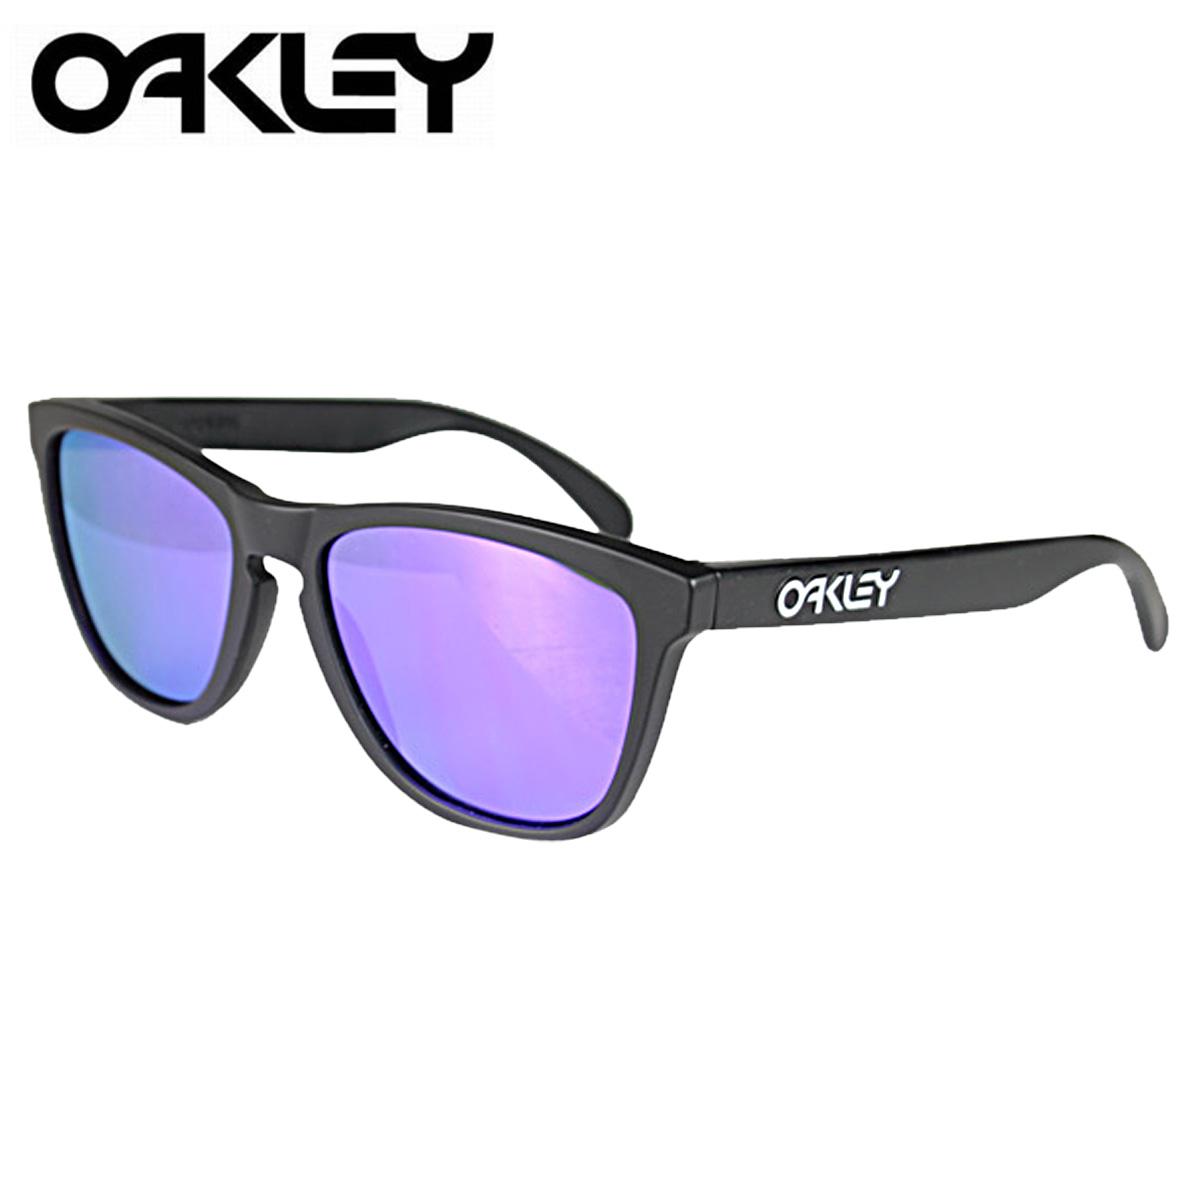 f2b003d433e7 ... buy allsports oakley oakley sunglasses frogskins frog skin mens womens  glasses 24 298 matte black violet